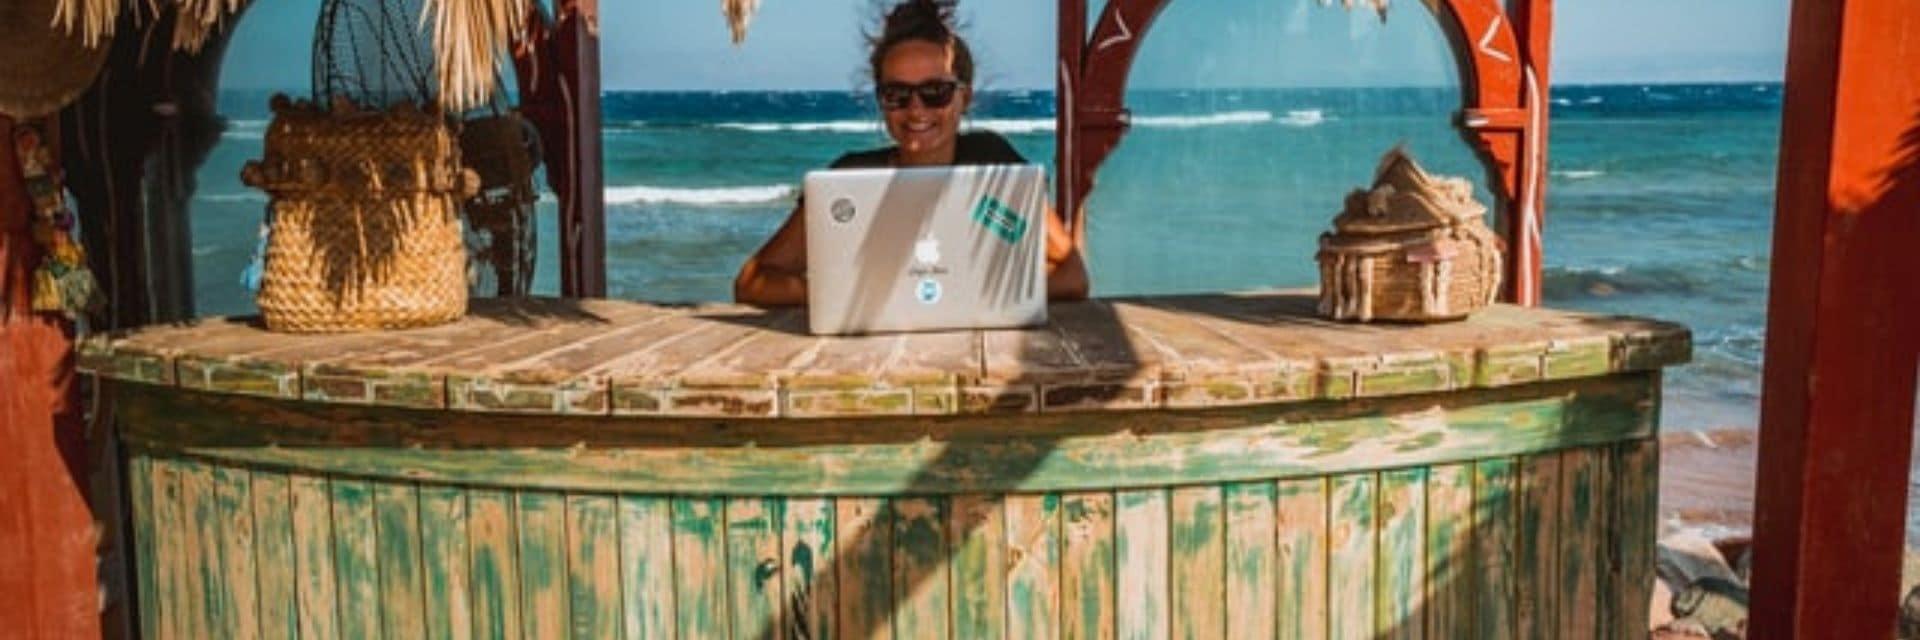 Digital nomad working in beach kiosk